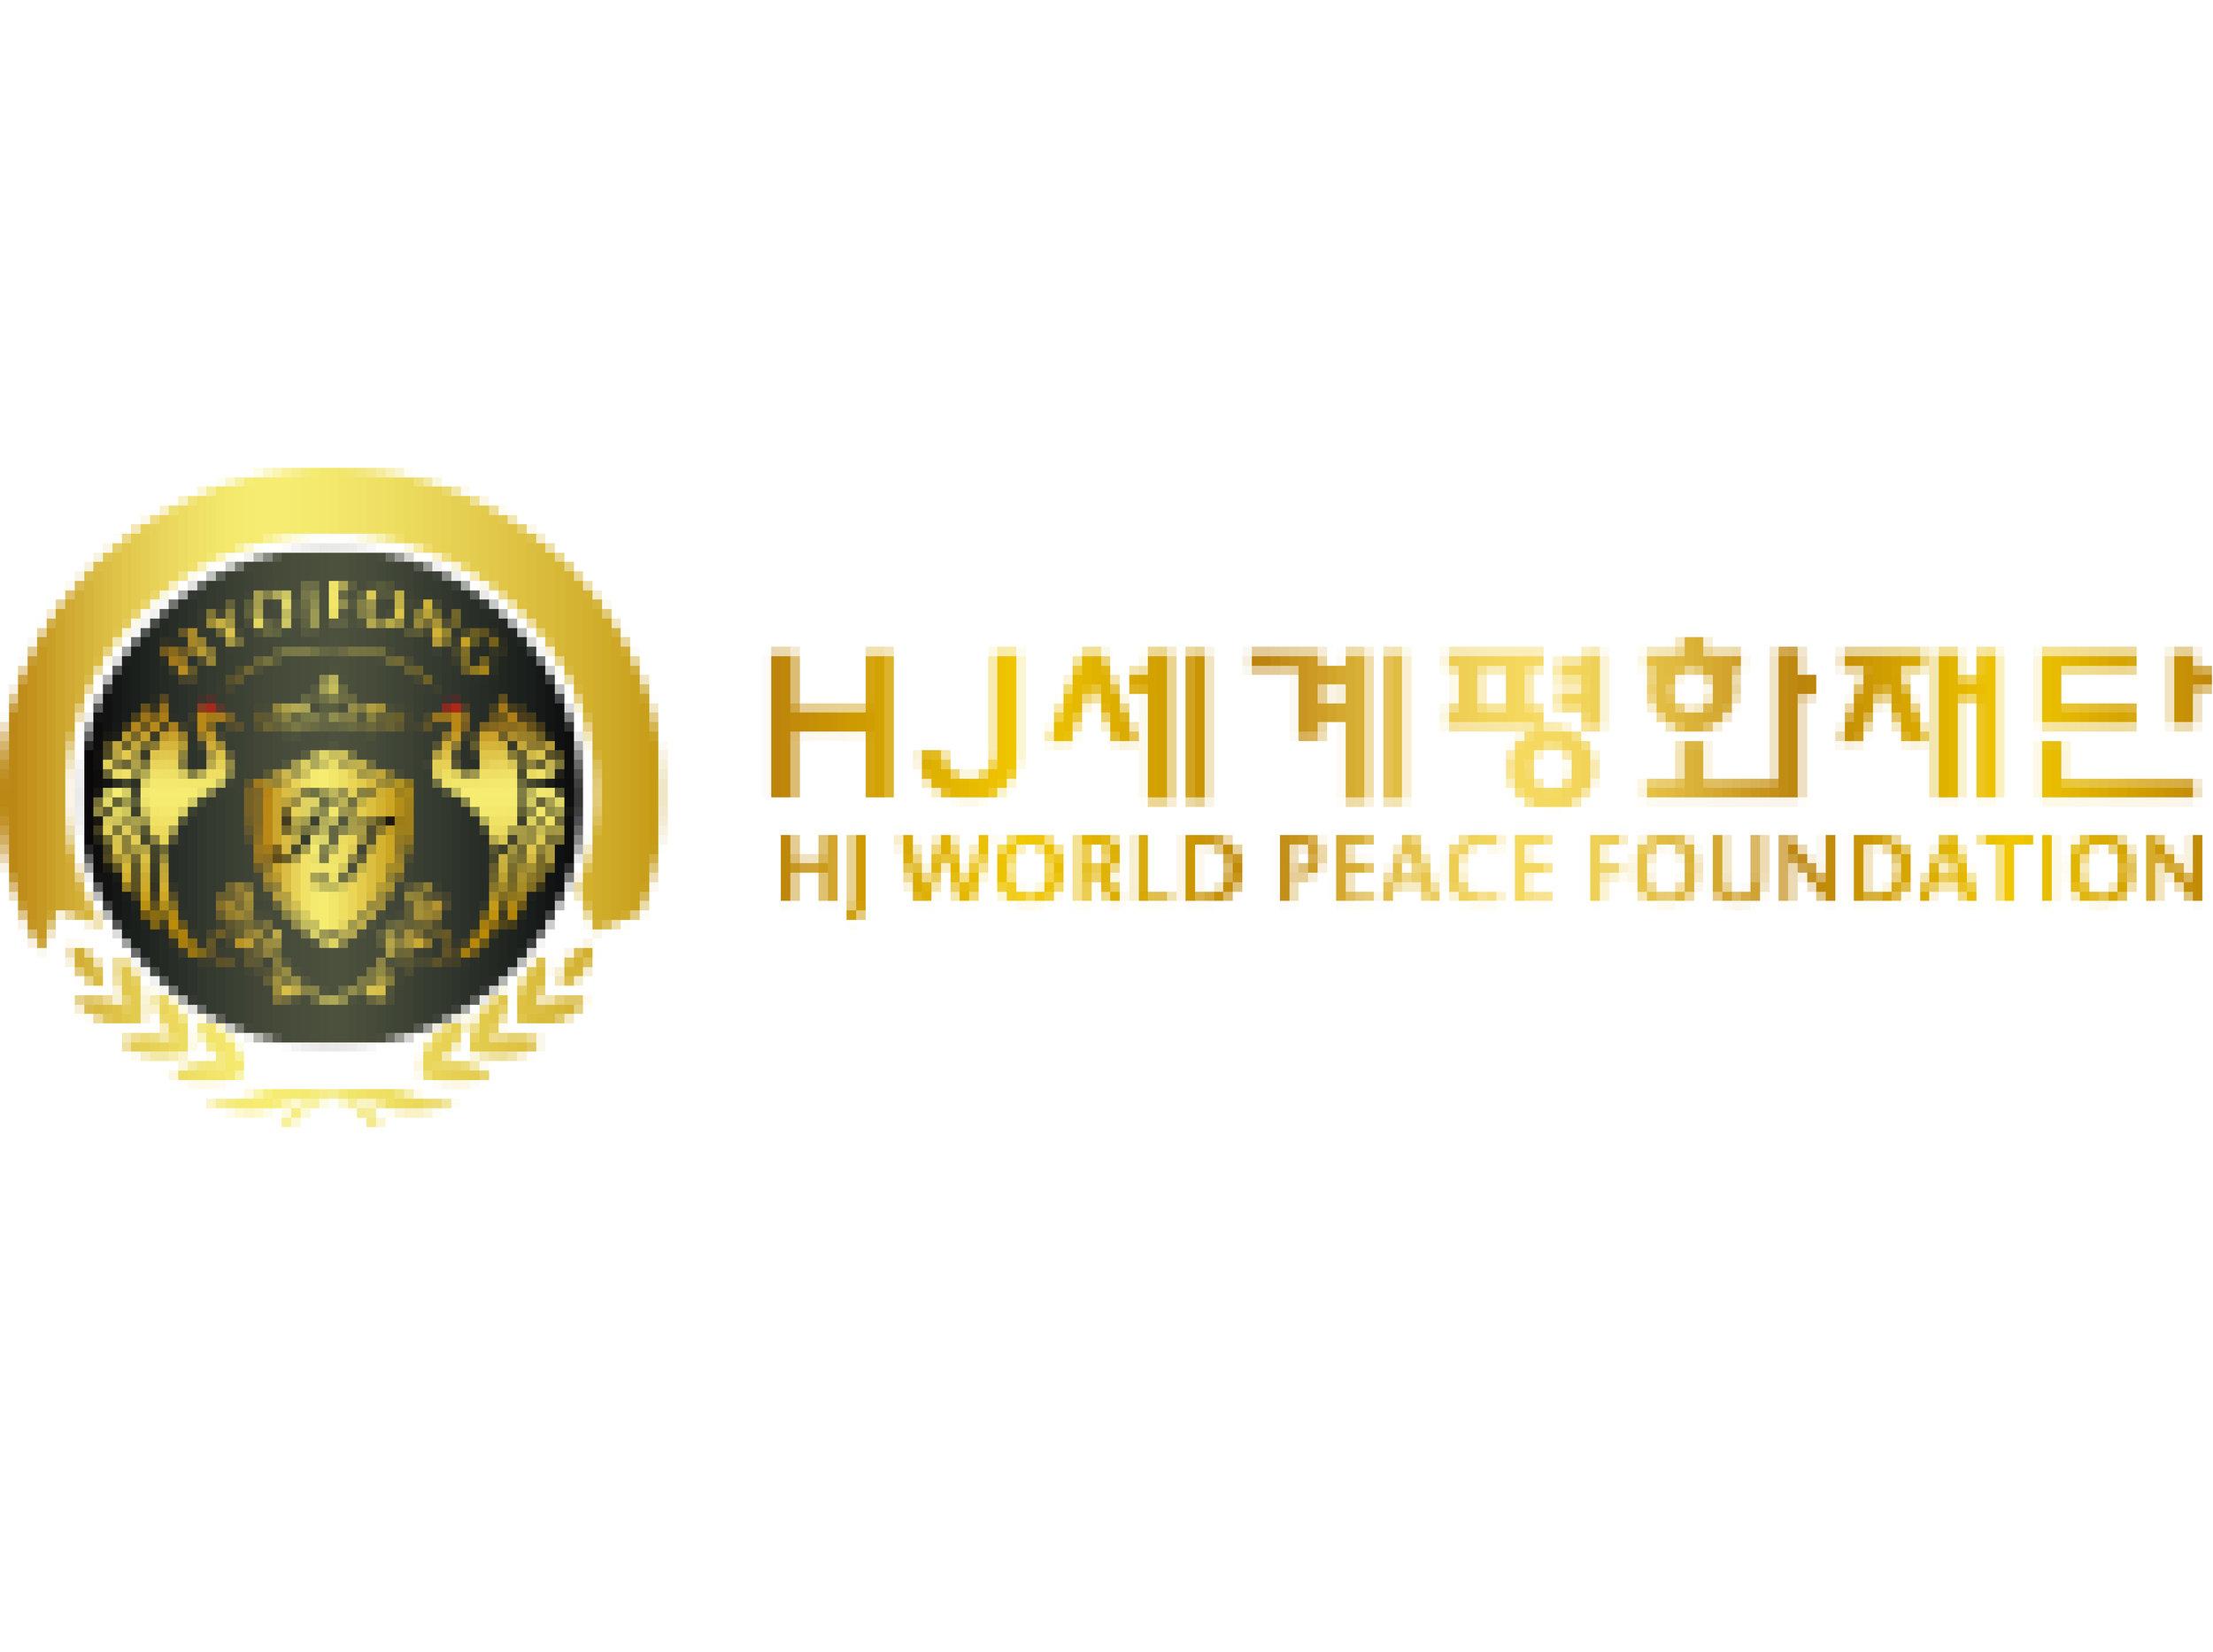 HJ World Peace Foundation